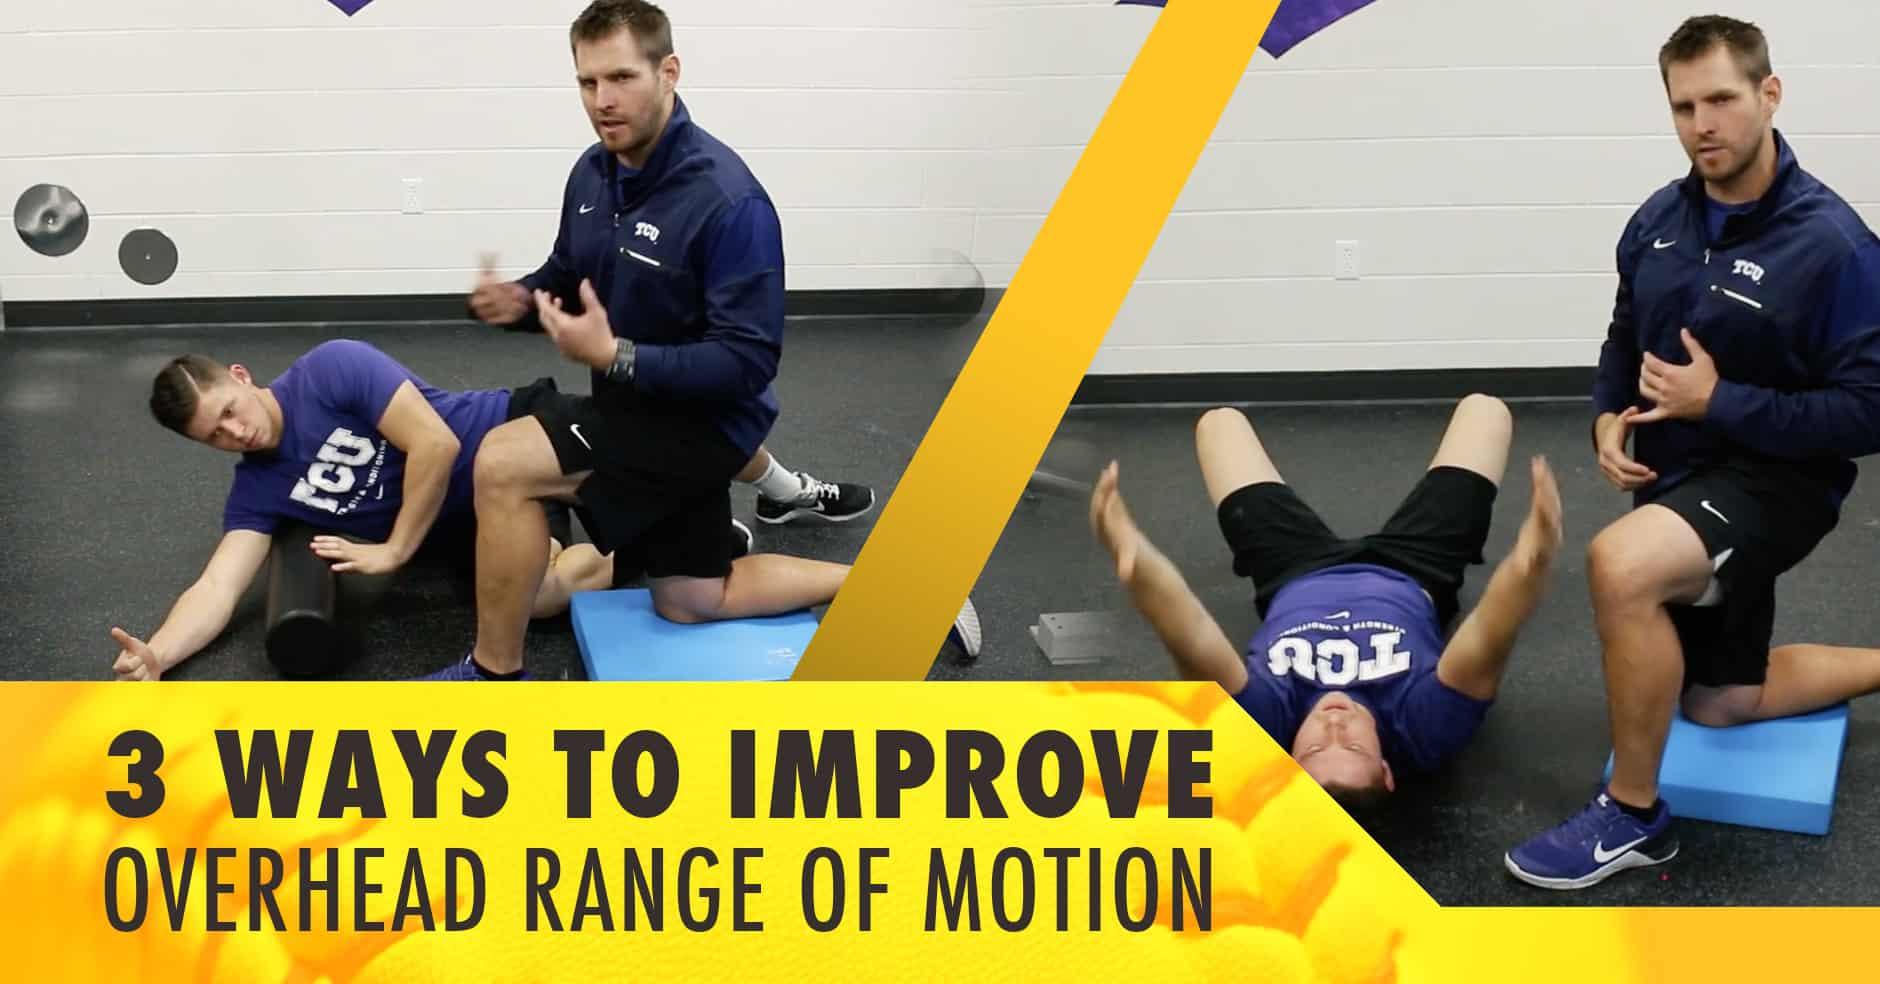 Health 3 Ways To Improve Overhead Range Of Motion